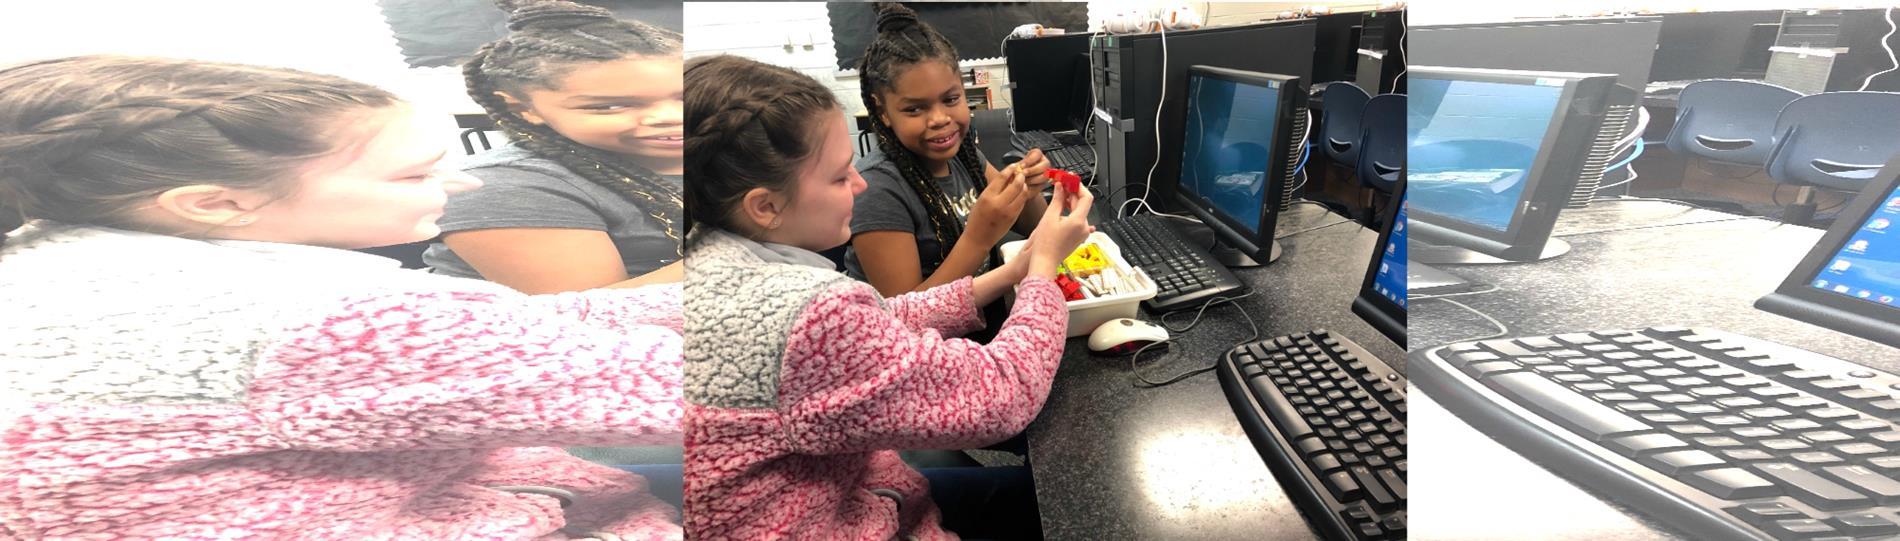 Kids working with legos robotics